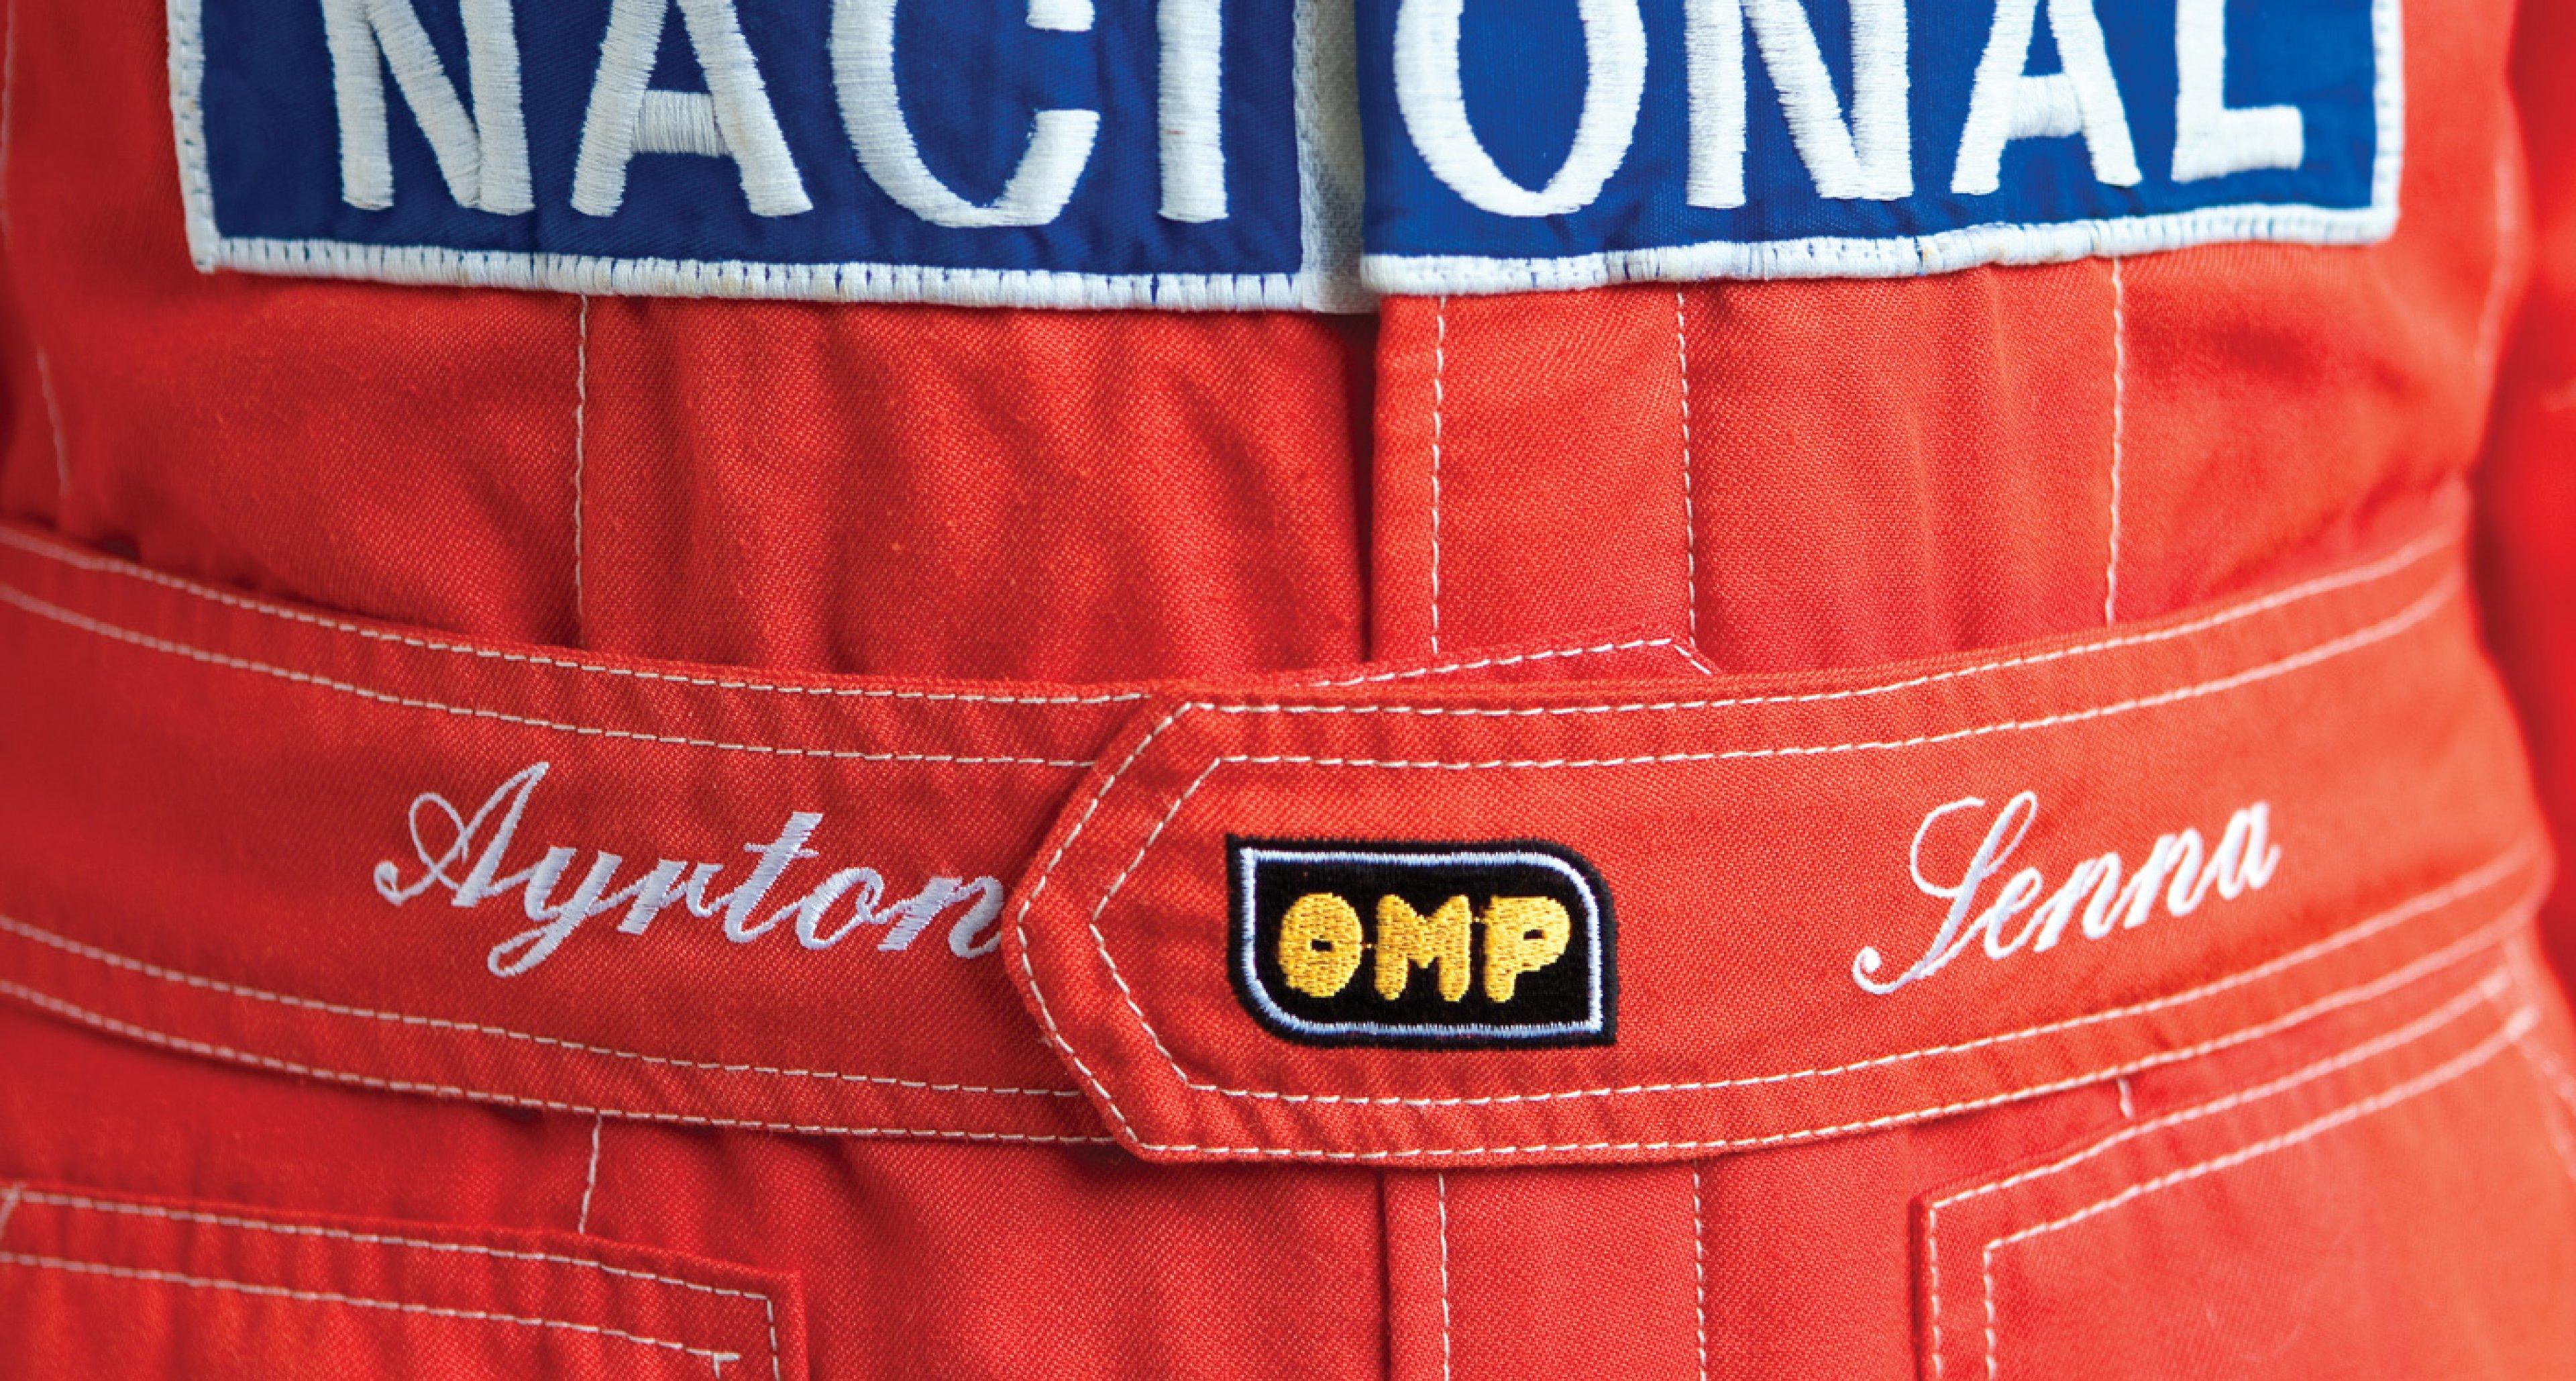 Lot 104 / 1991 Ayrton Senna F1 Race Suit / € 55,575